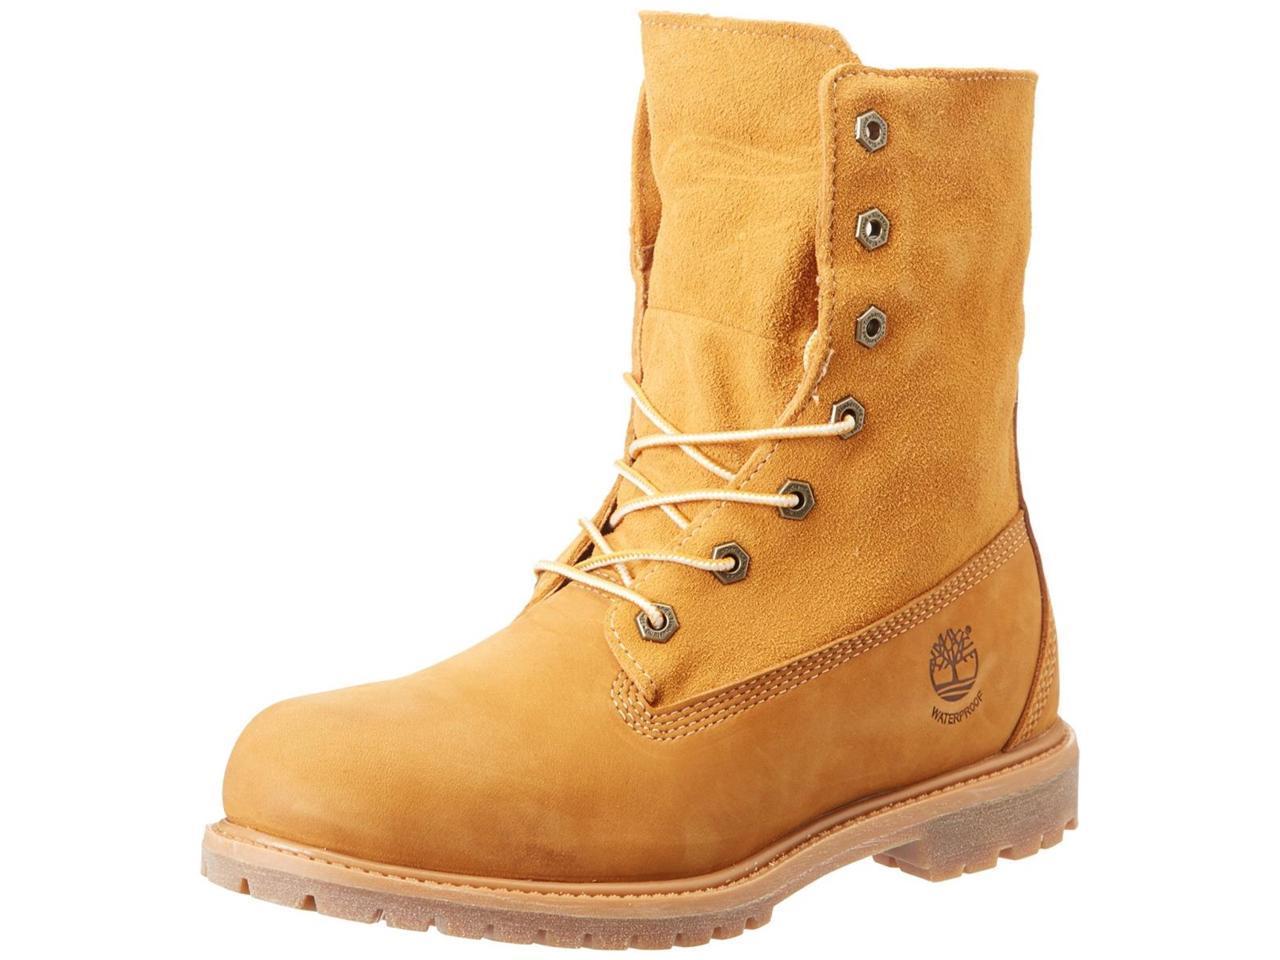 Timberland Women Boots Teddy Fleece